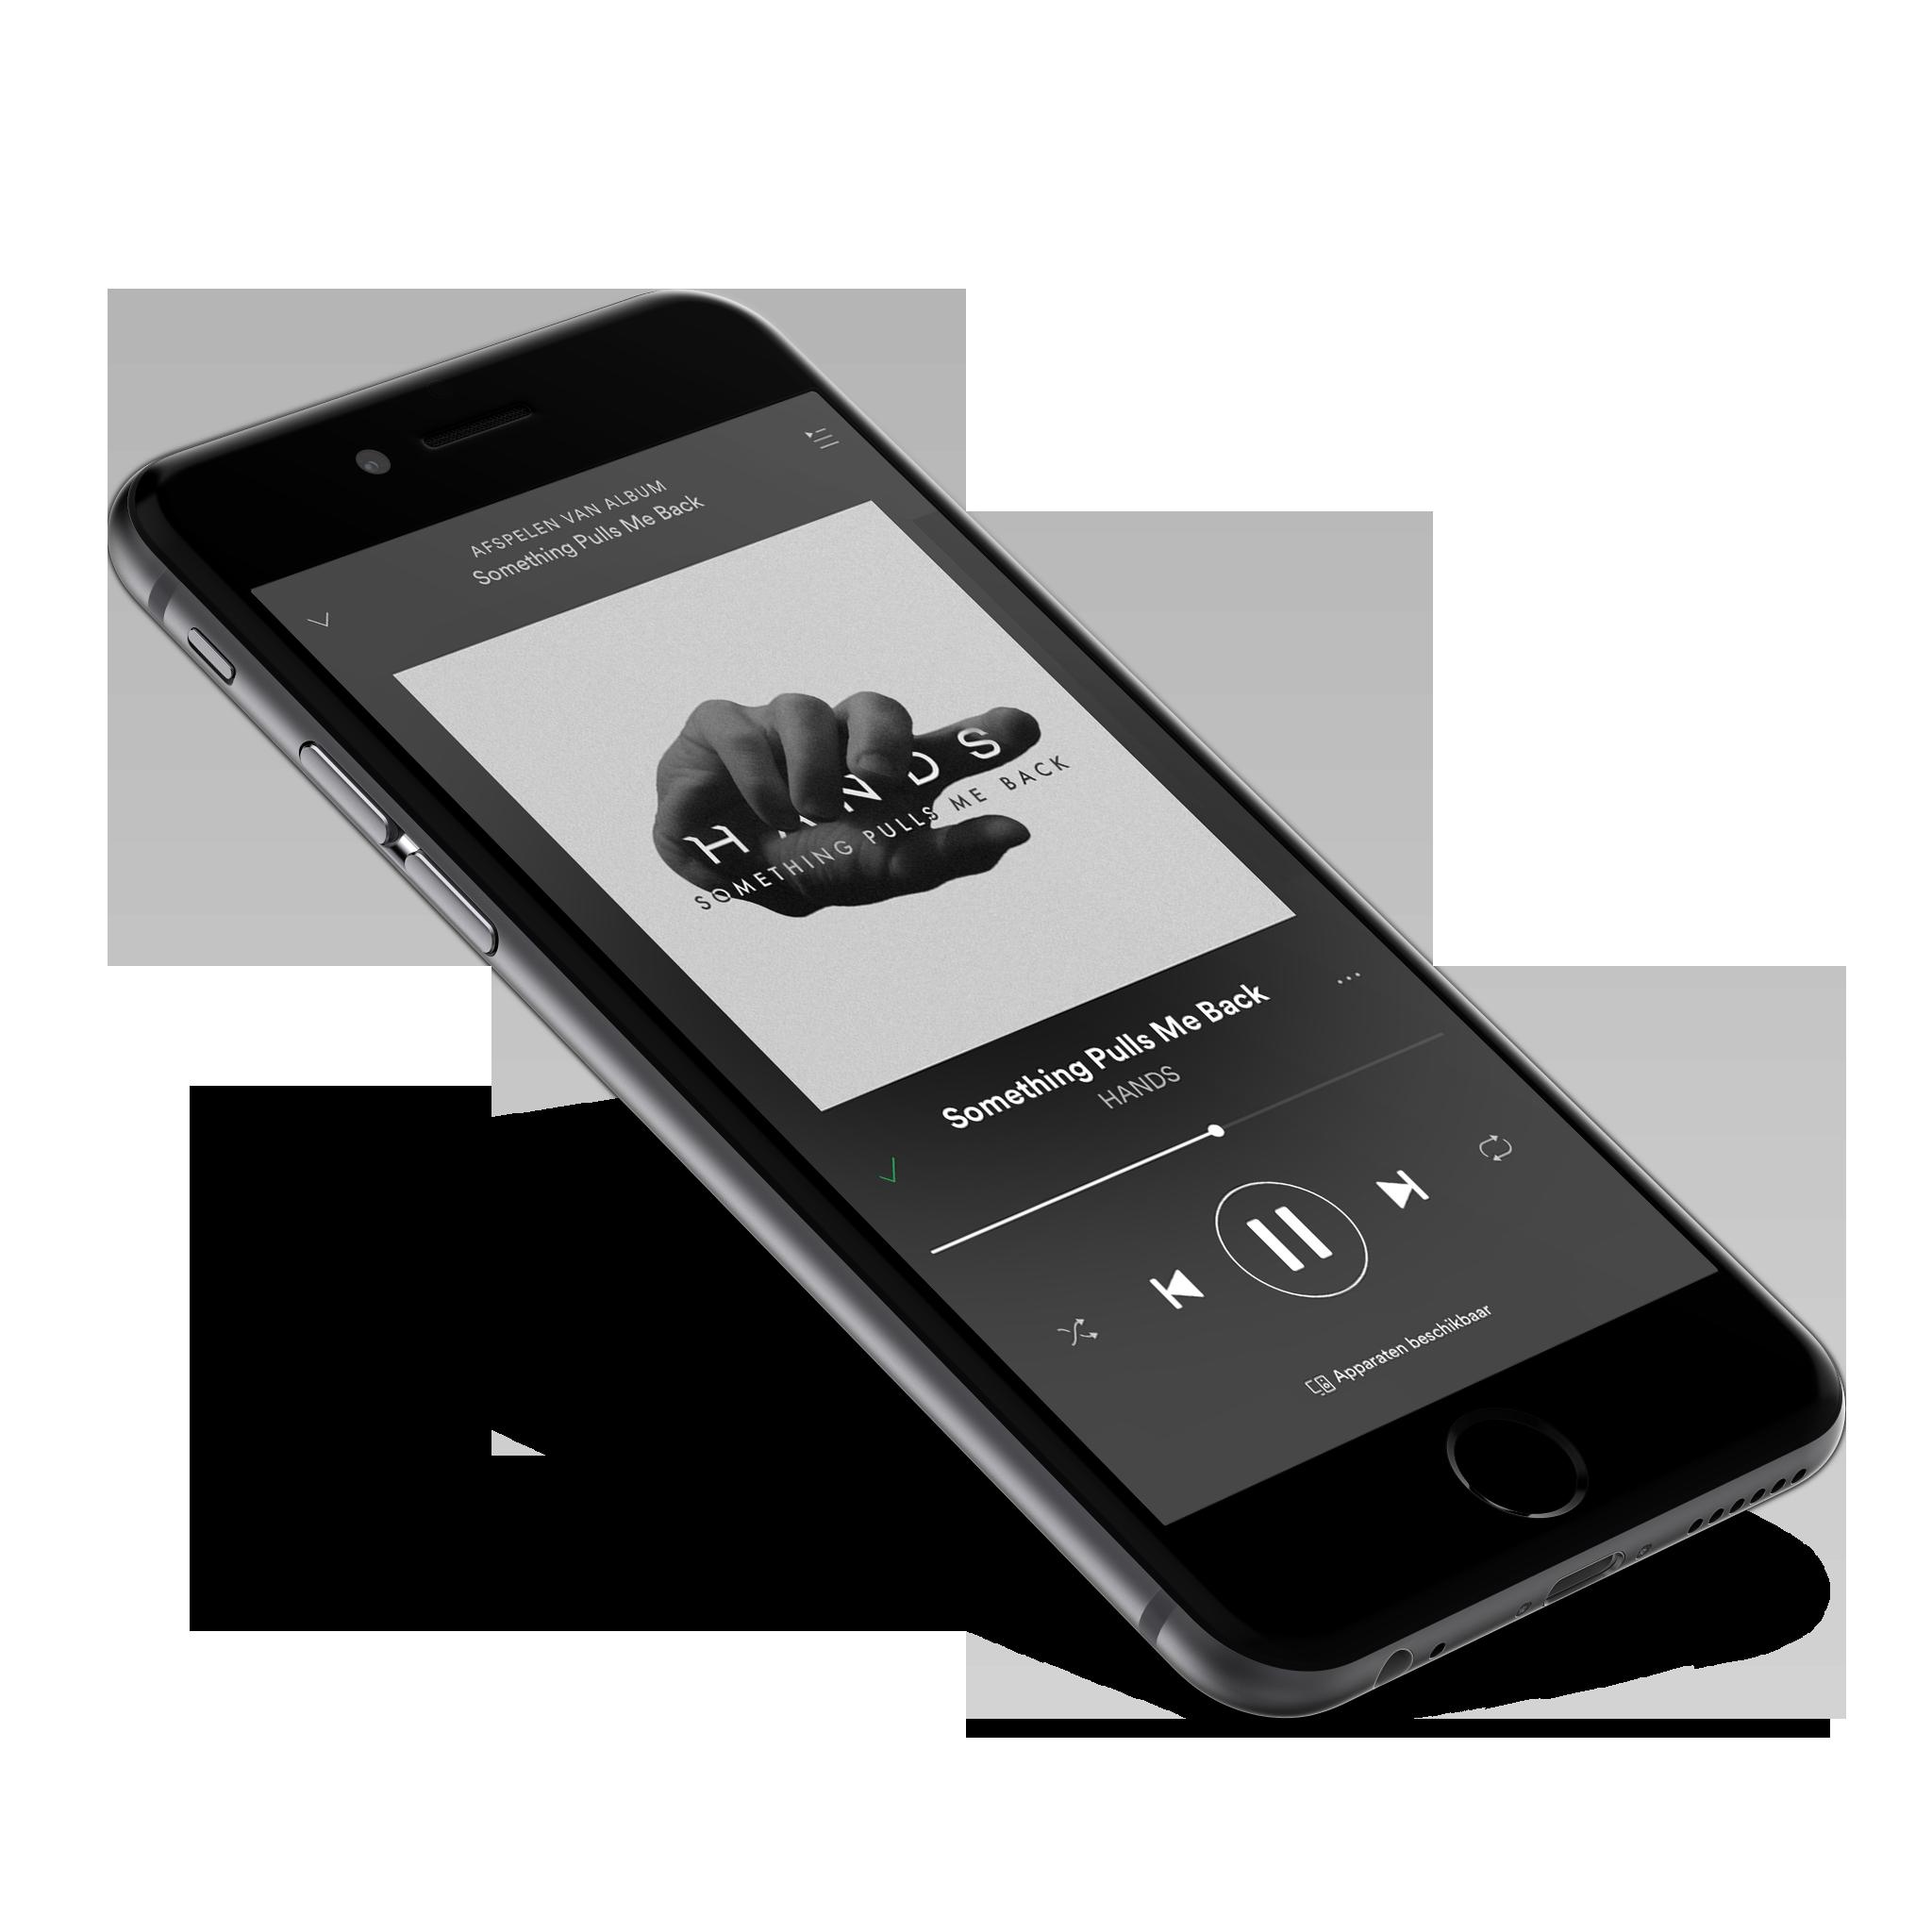 HANDS - Spotify iPhone Mockup - Something Pulls Me Back Artwork